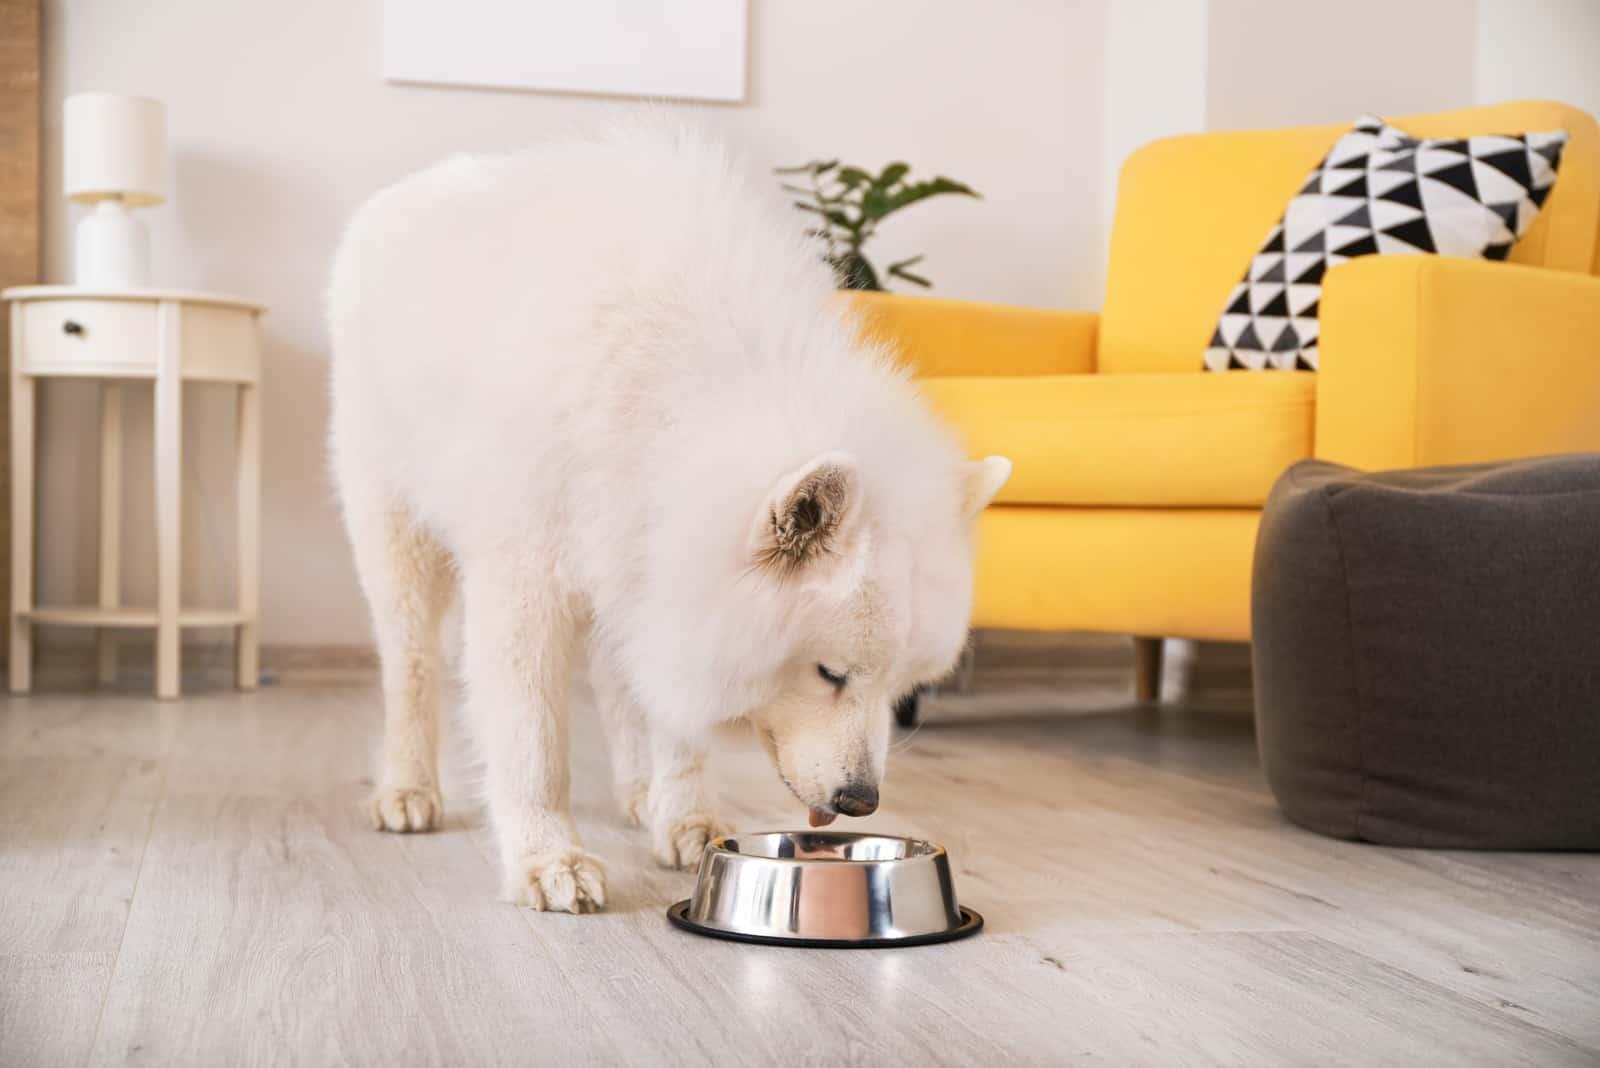 Samoyed dog eating from bowl at home